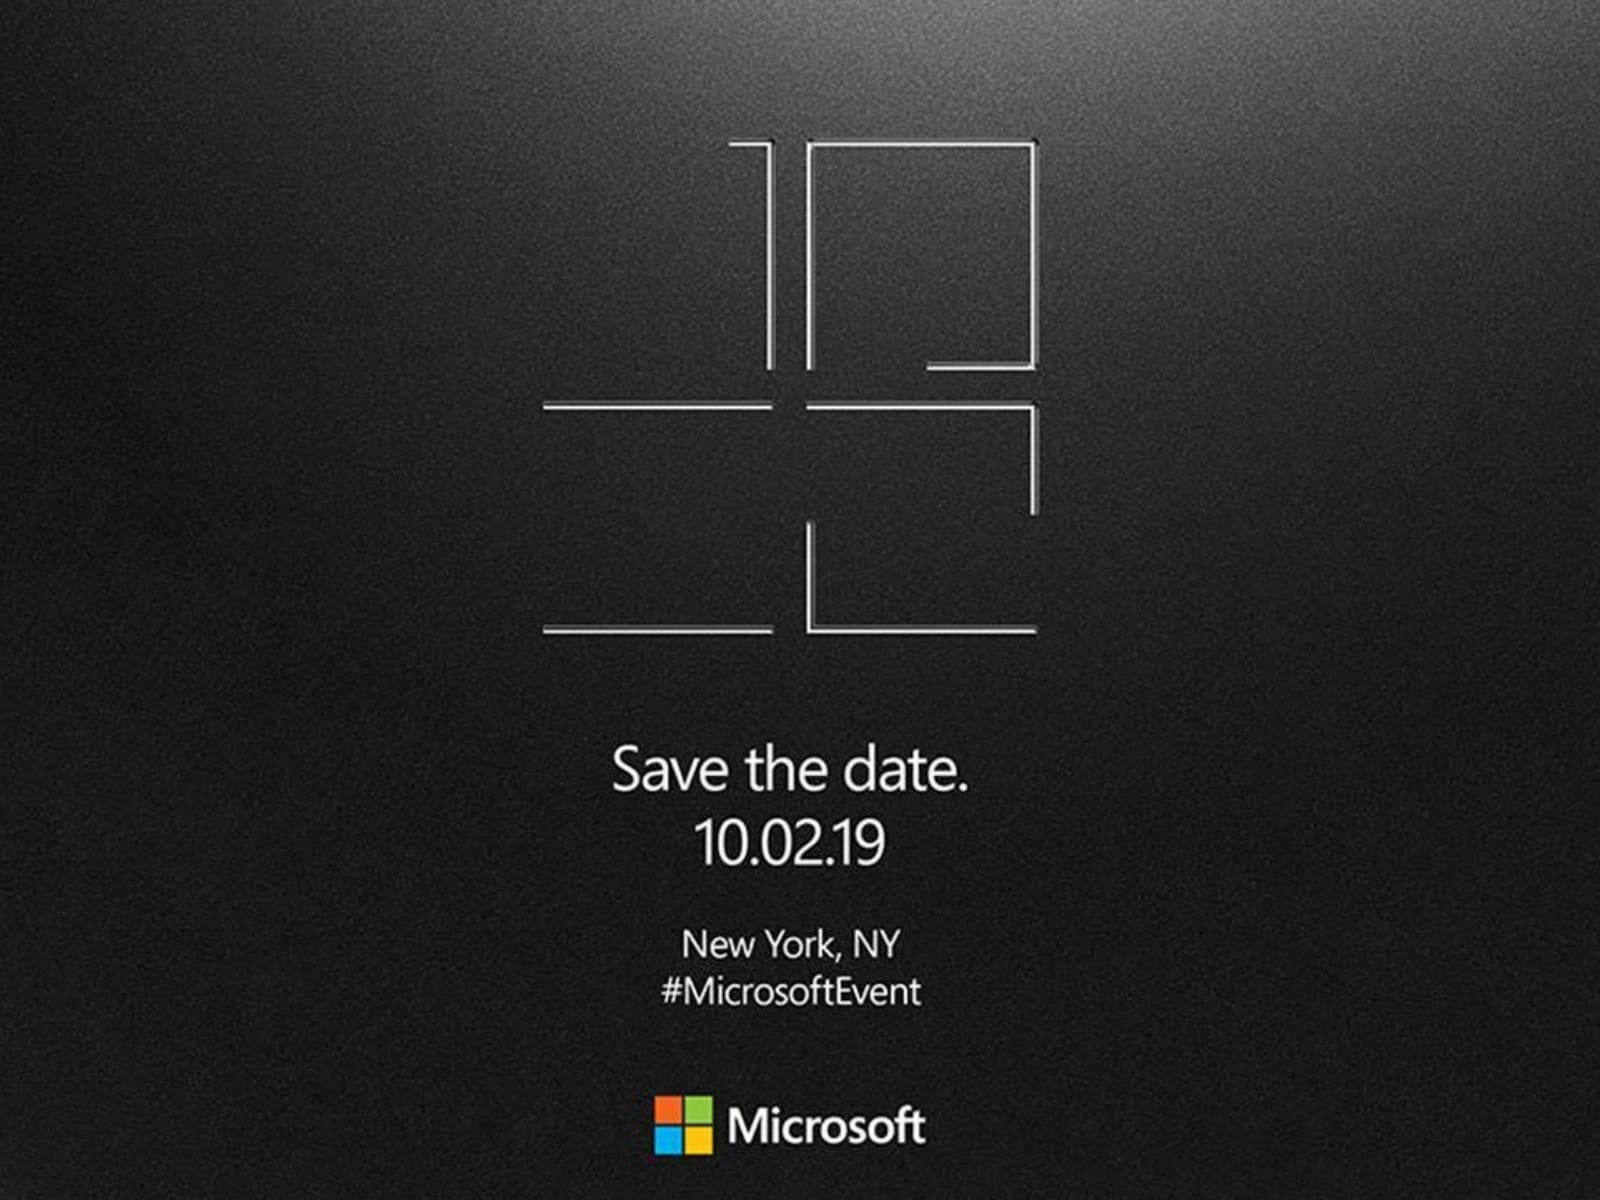 Surface 2019 invite